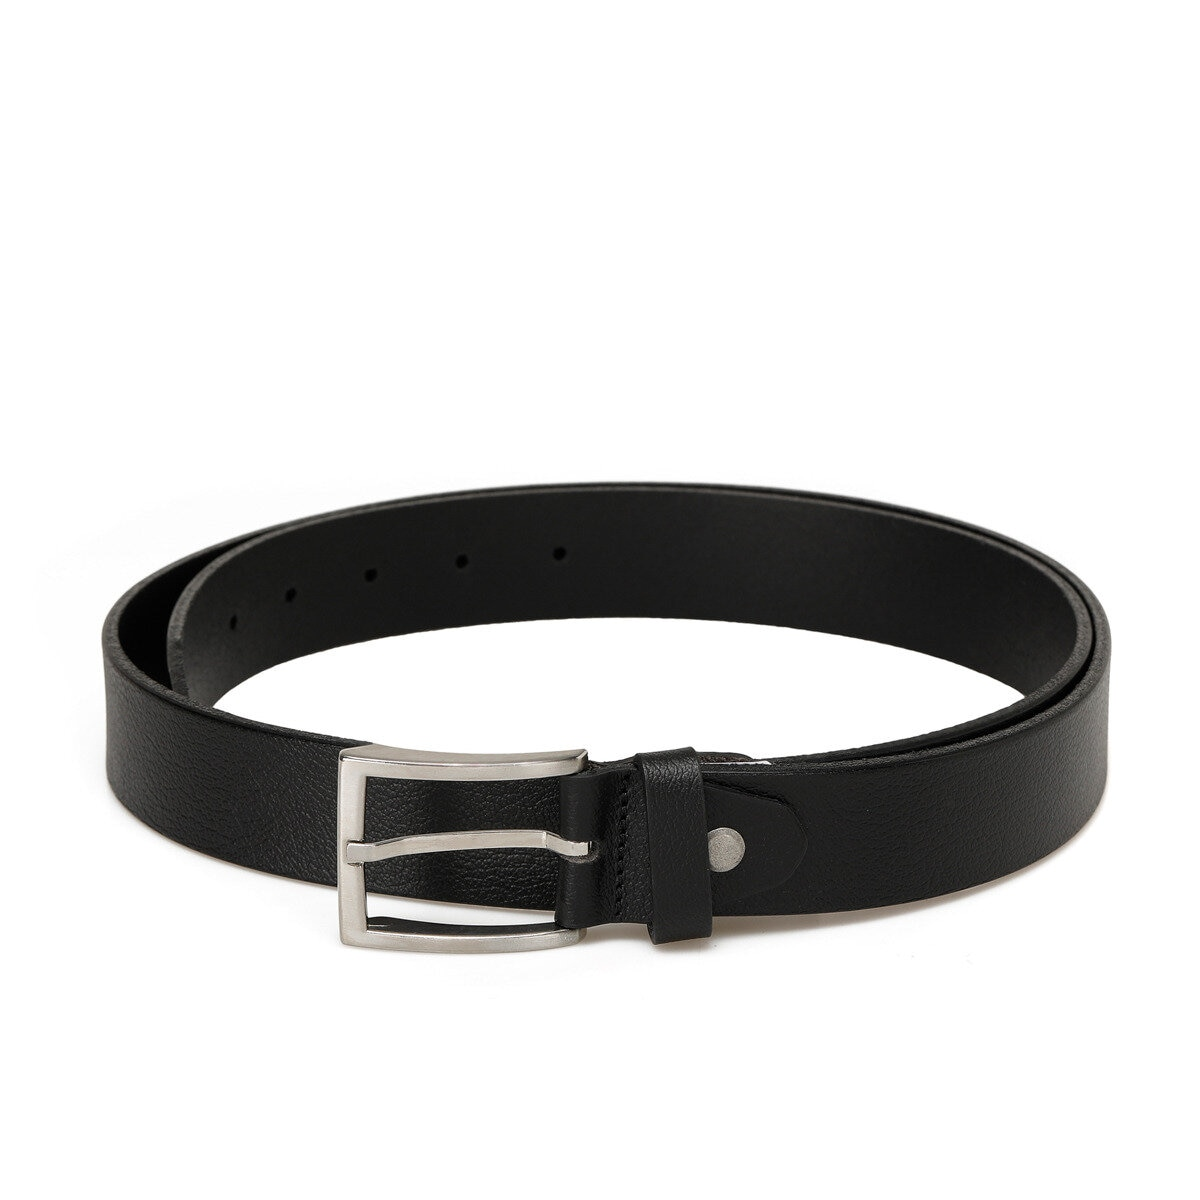 FLO 20M KLT cuero KMR negro masculino cinturón Garamond